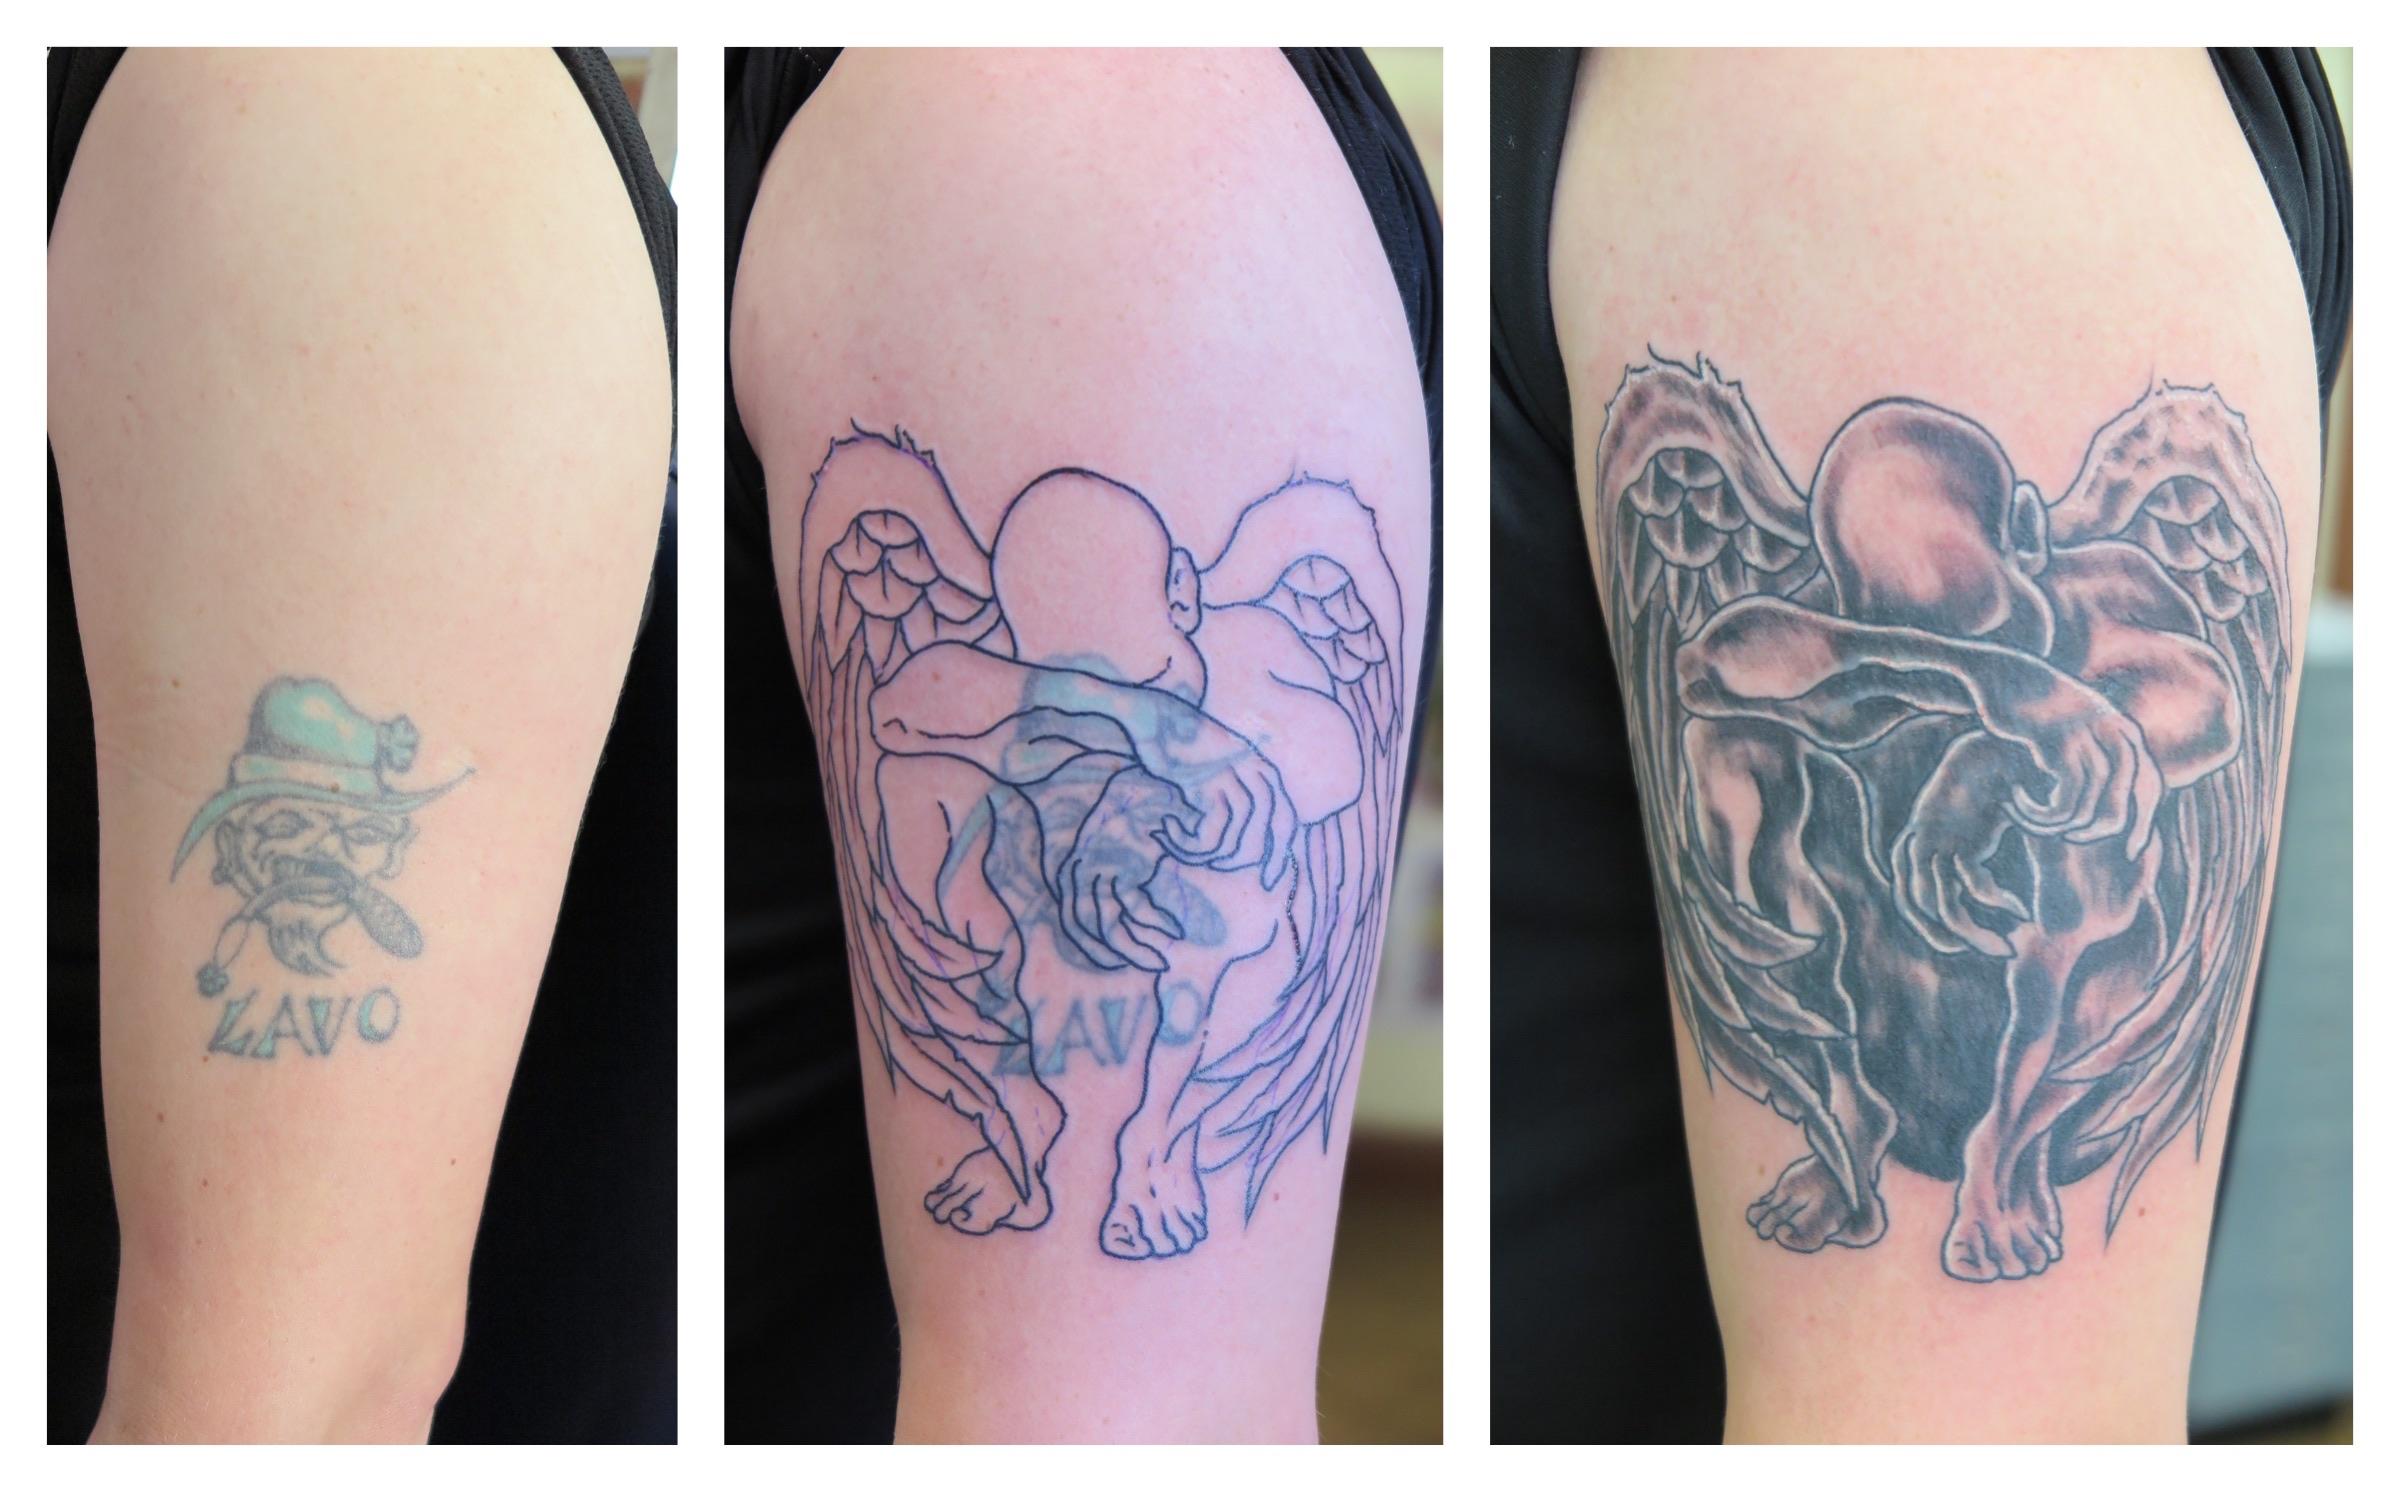 Tattoo laser removal ireland tattoo removal chicago suburbs for Laser tattoo removal chicago